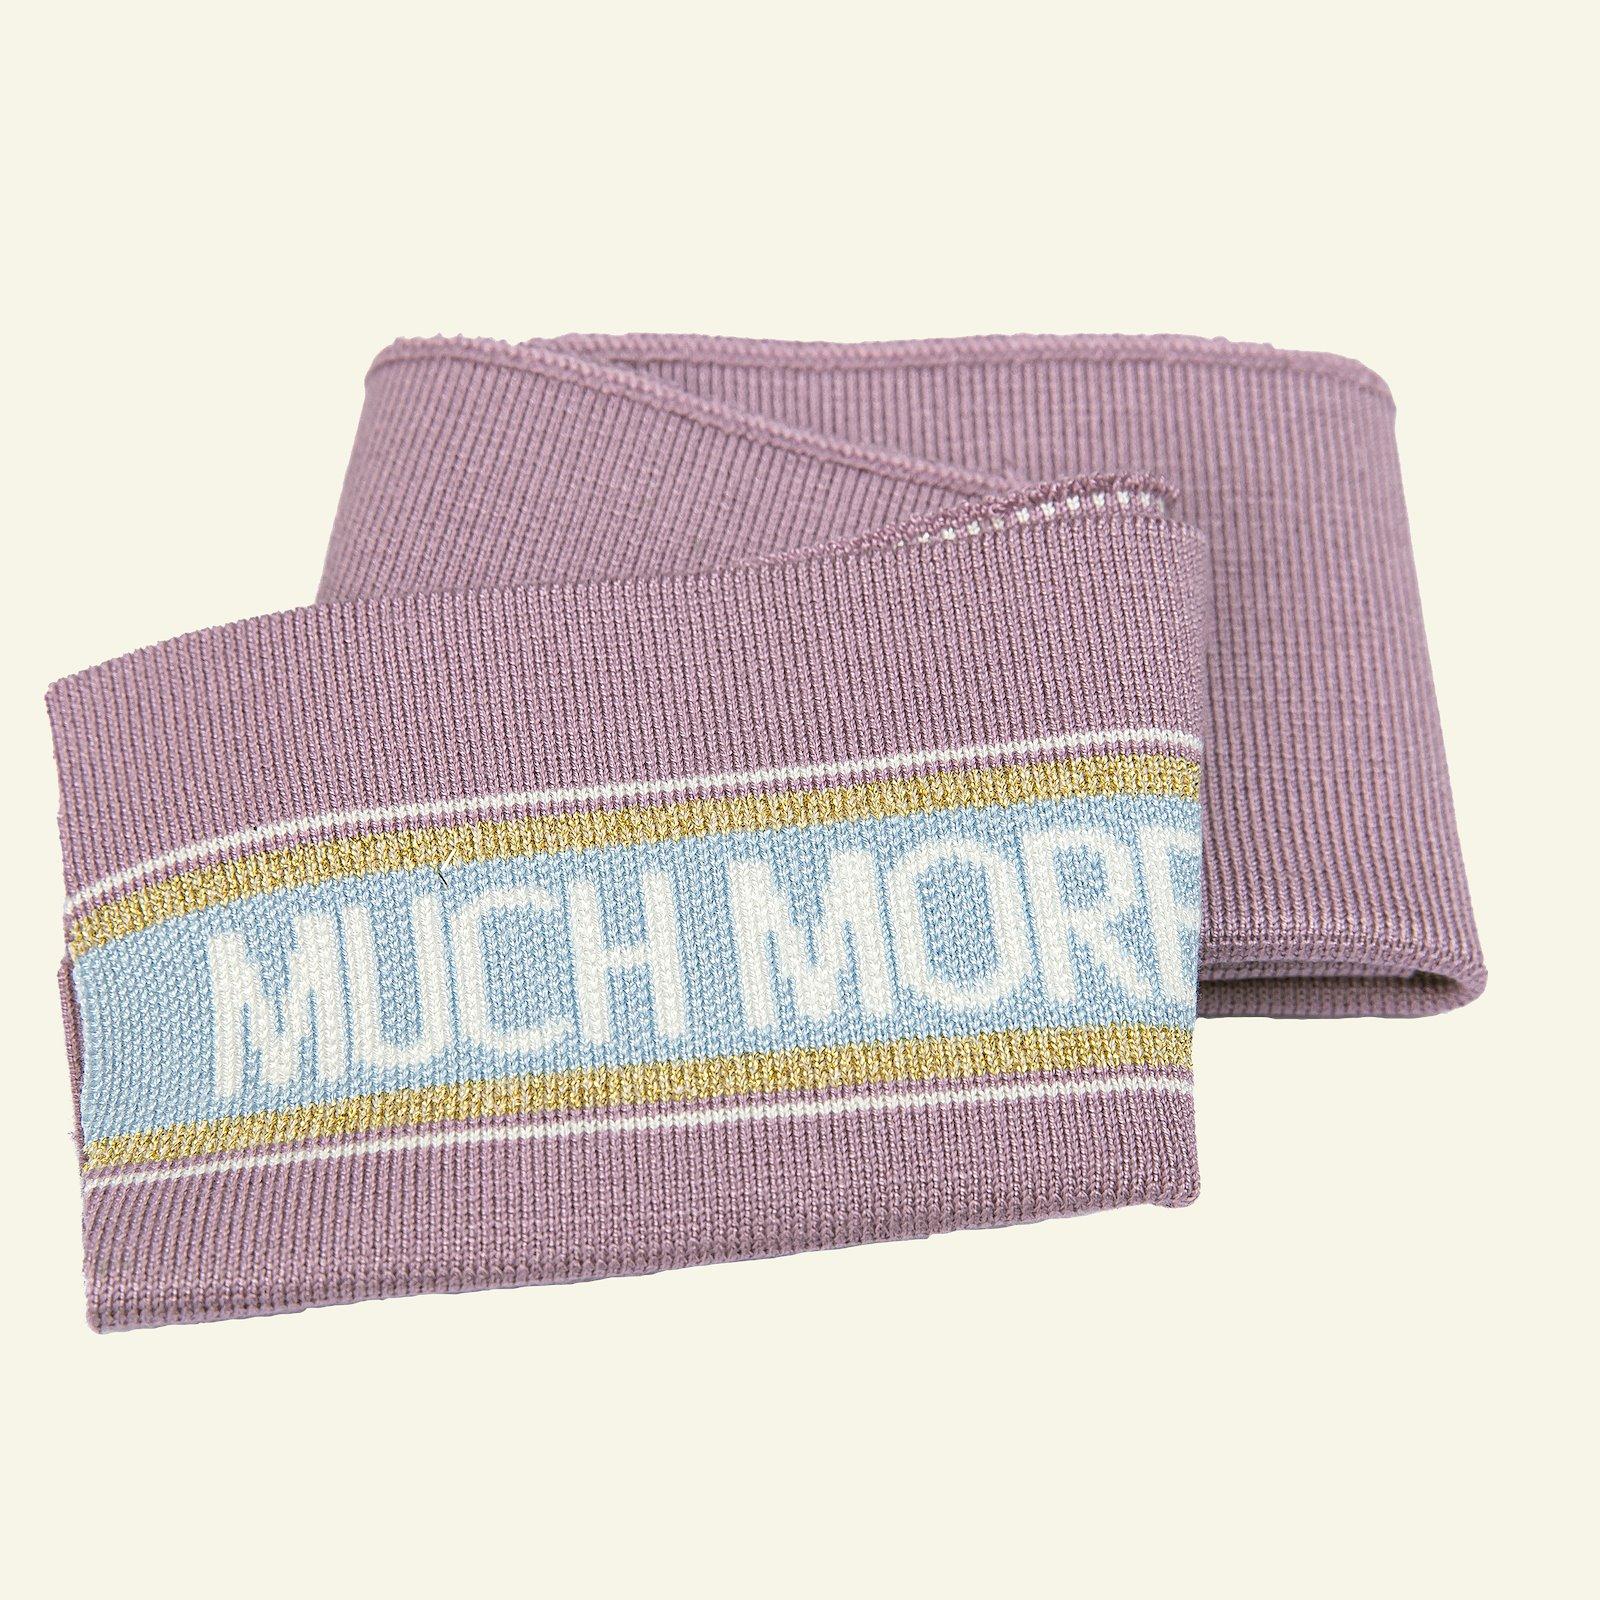 1x1 rib fold 14x100cm dusty pink 1pc 96187_pack